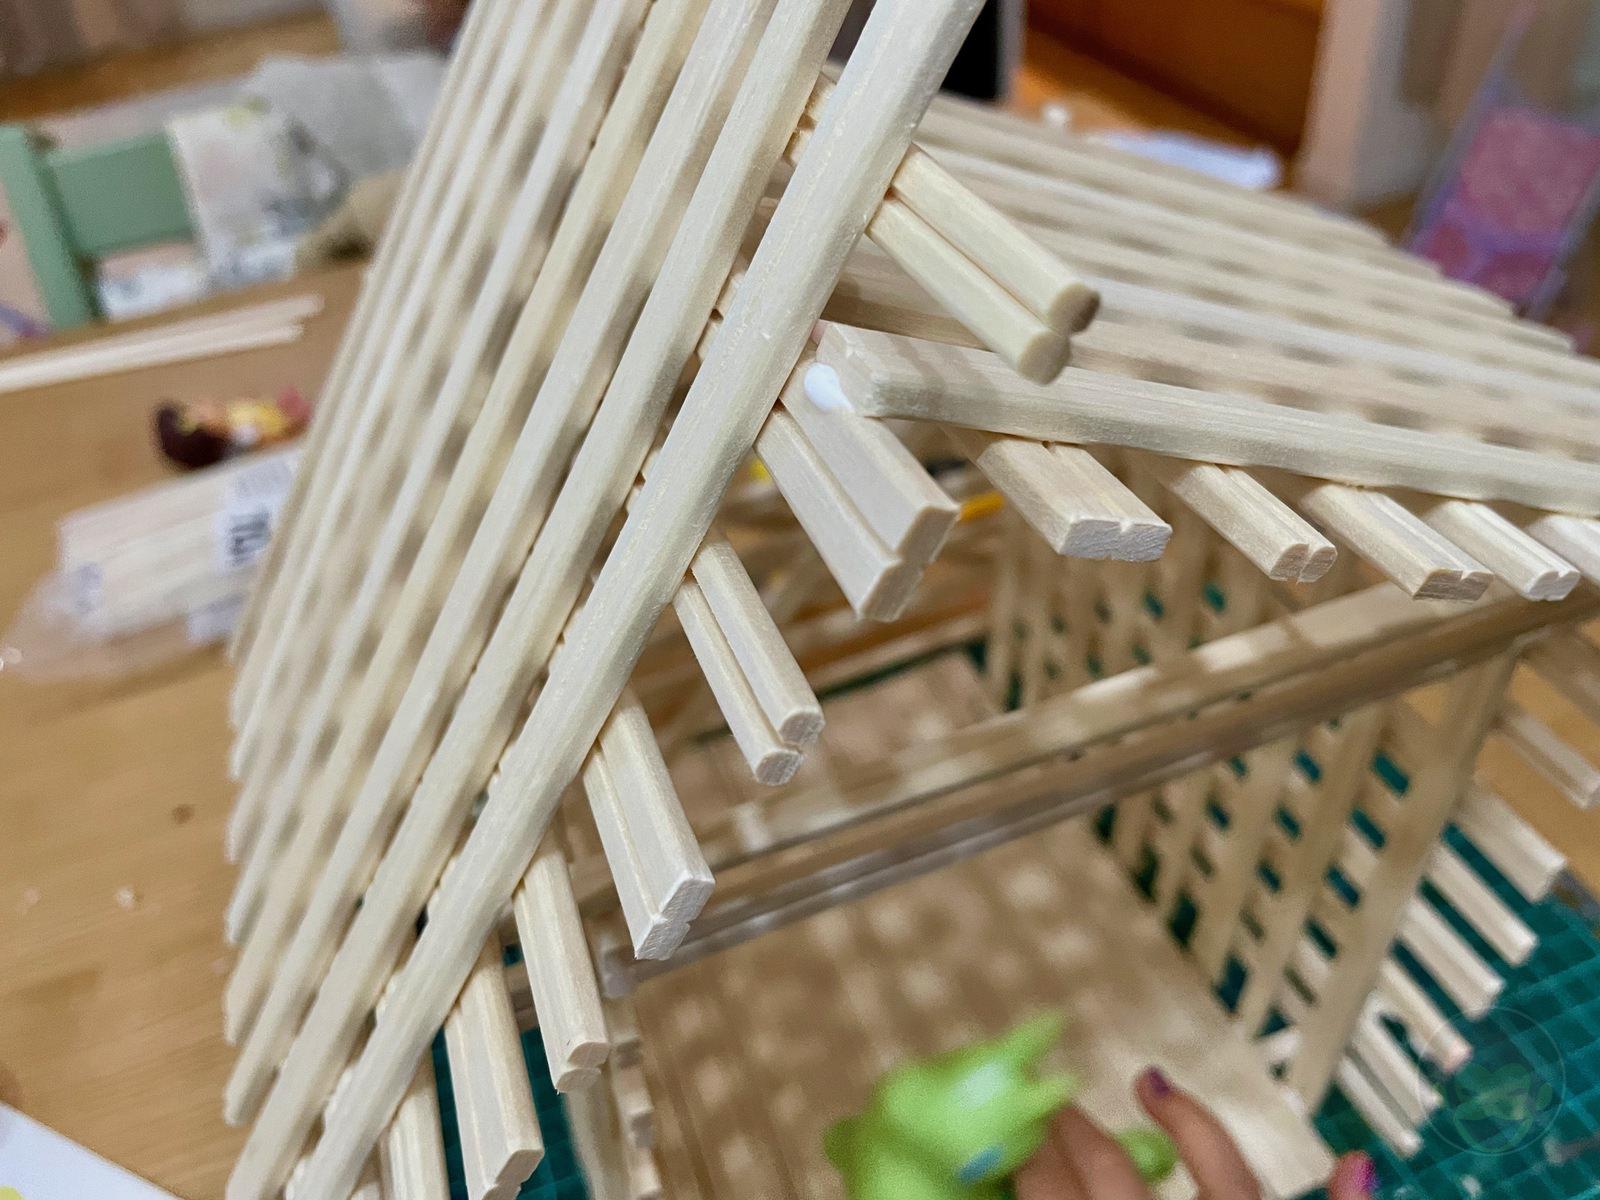 Making House with Chopsticks papame 07